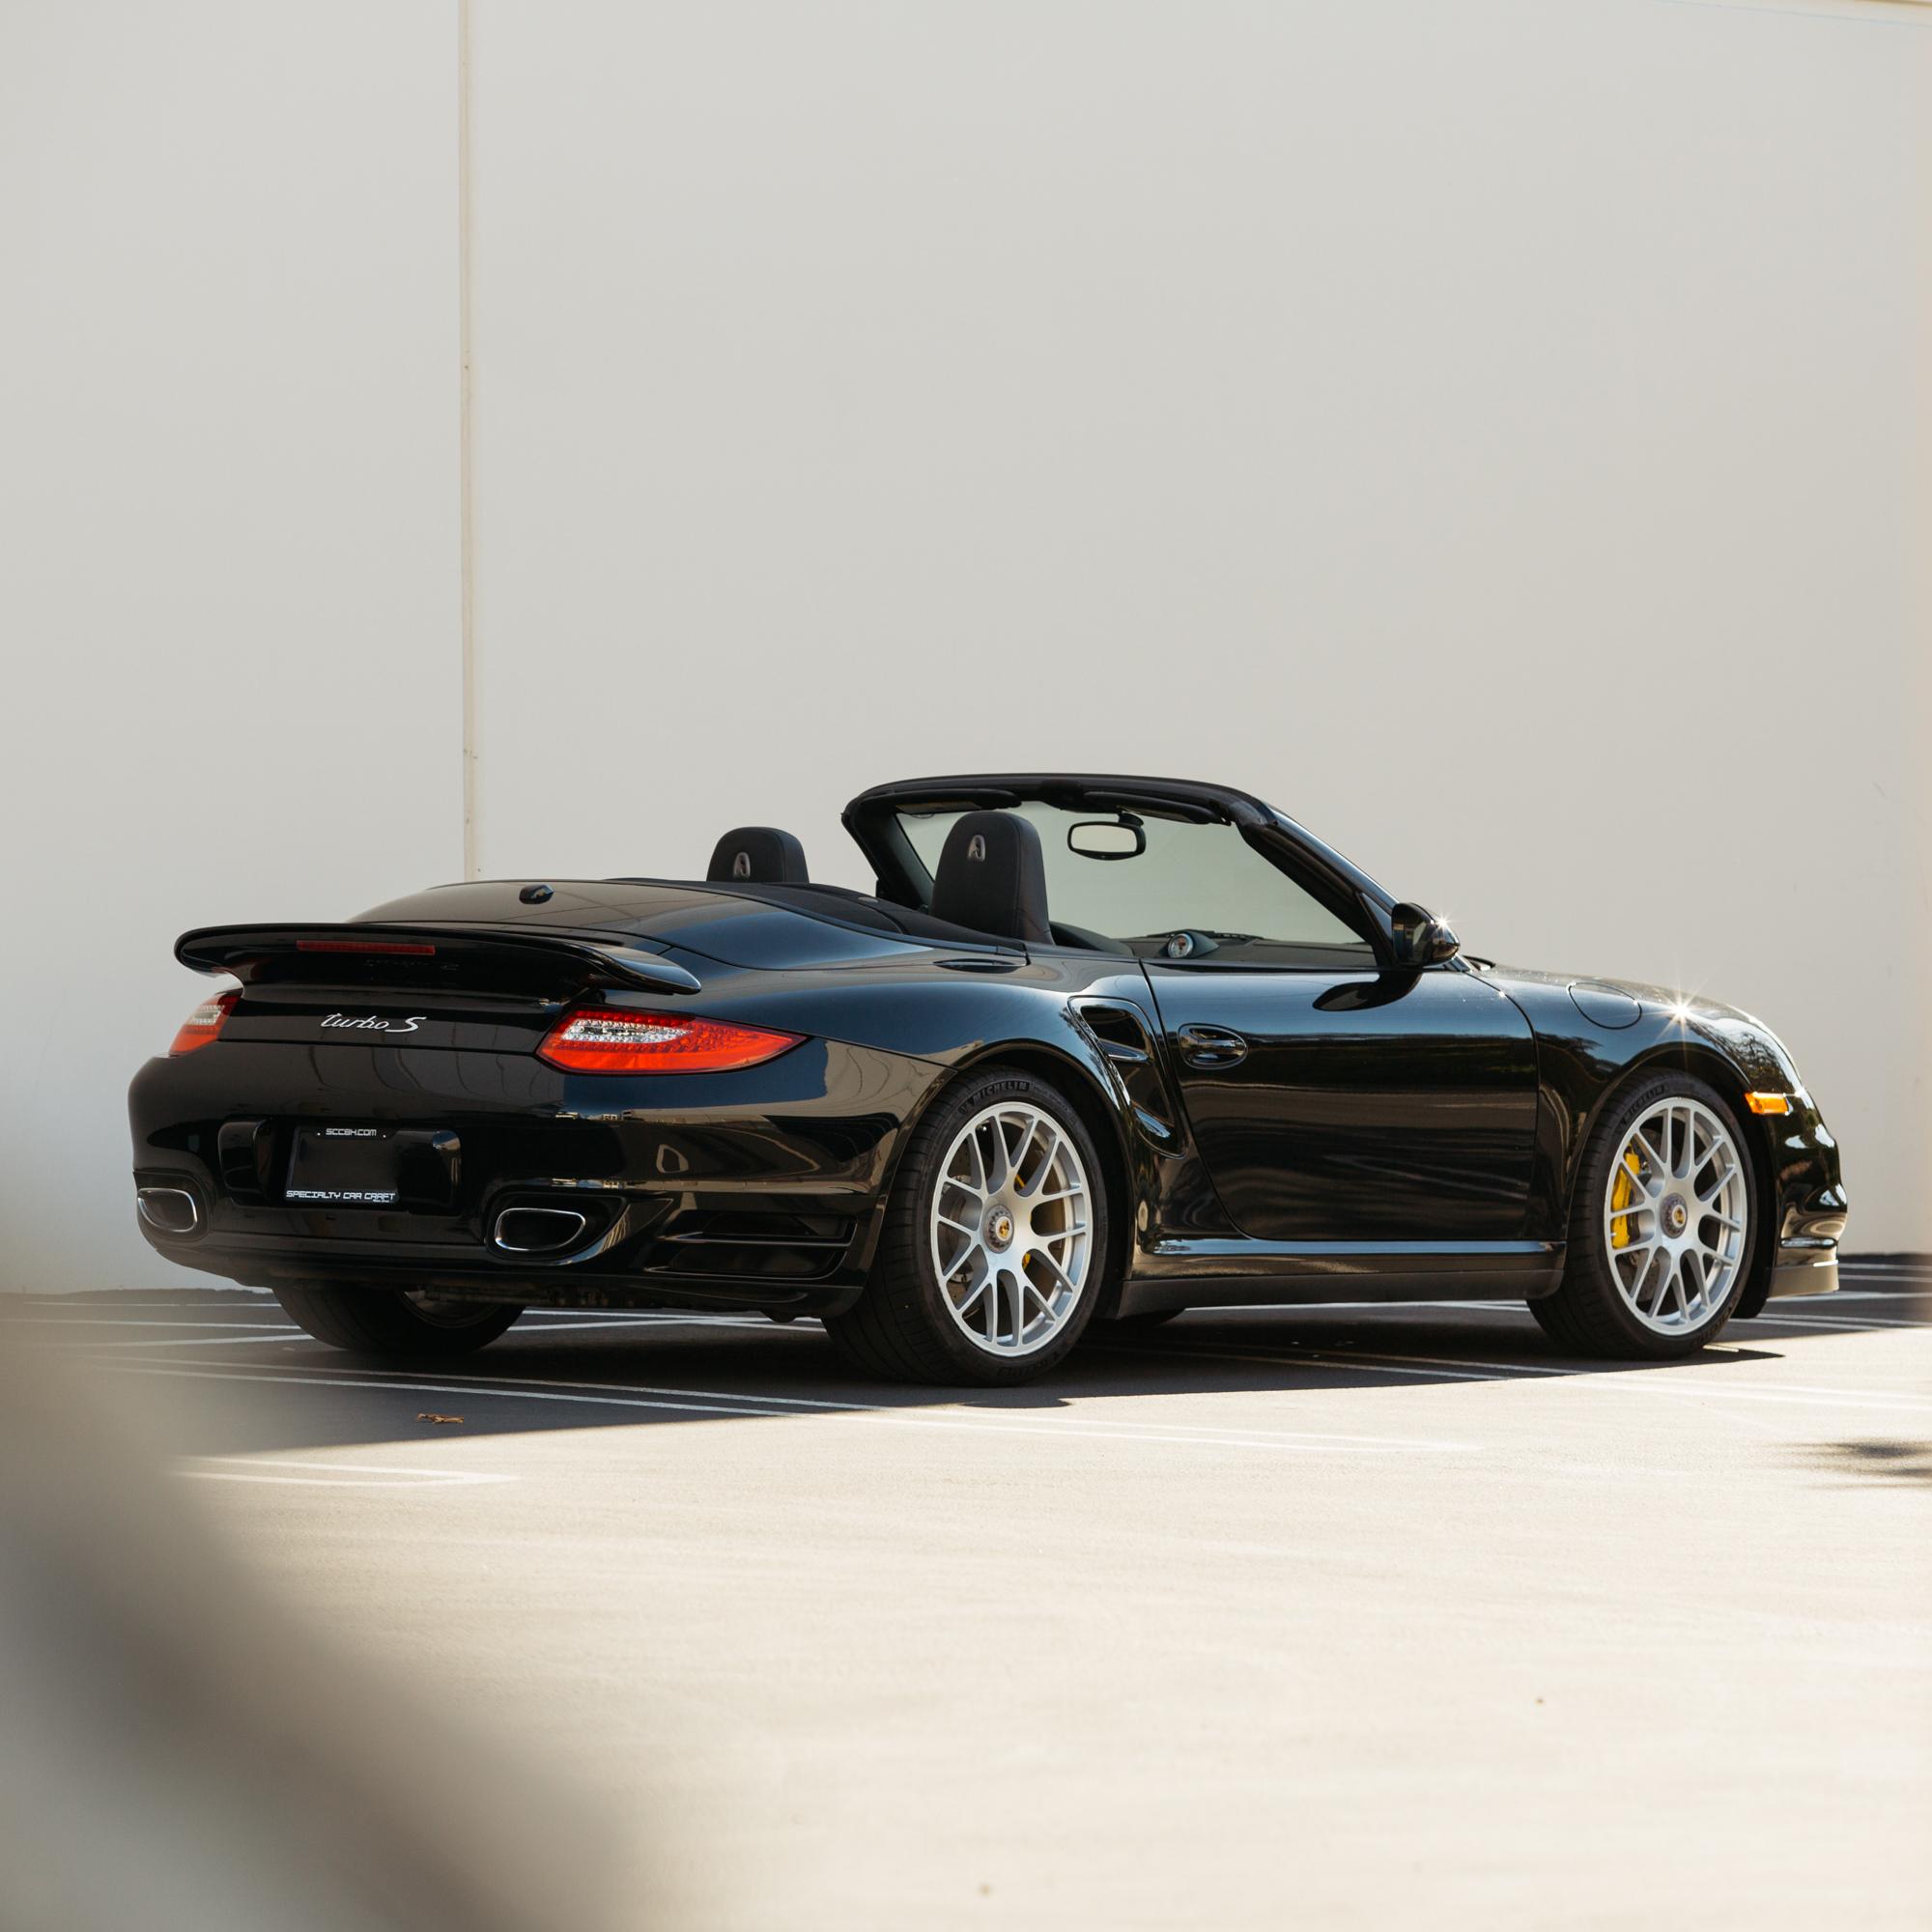 2010 Porsche 997 Turbo S